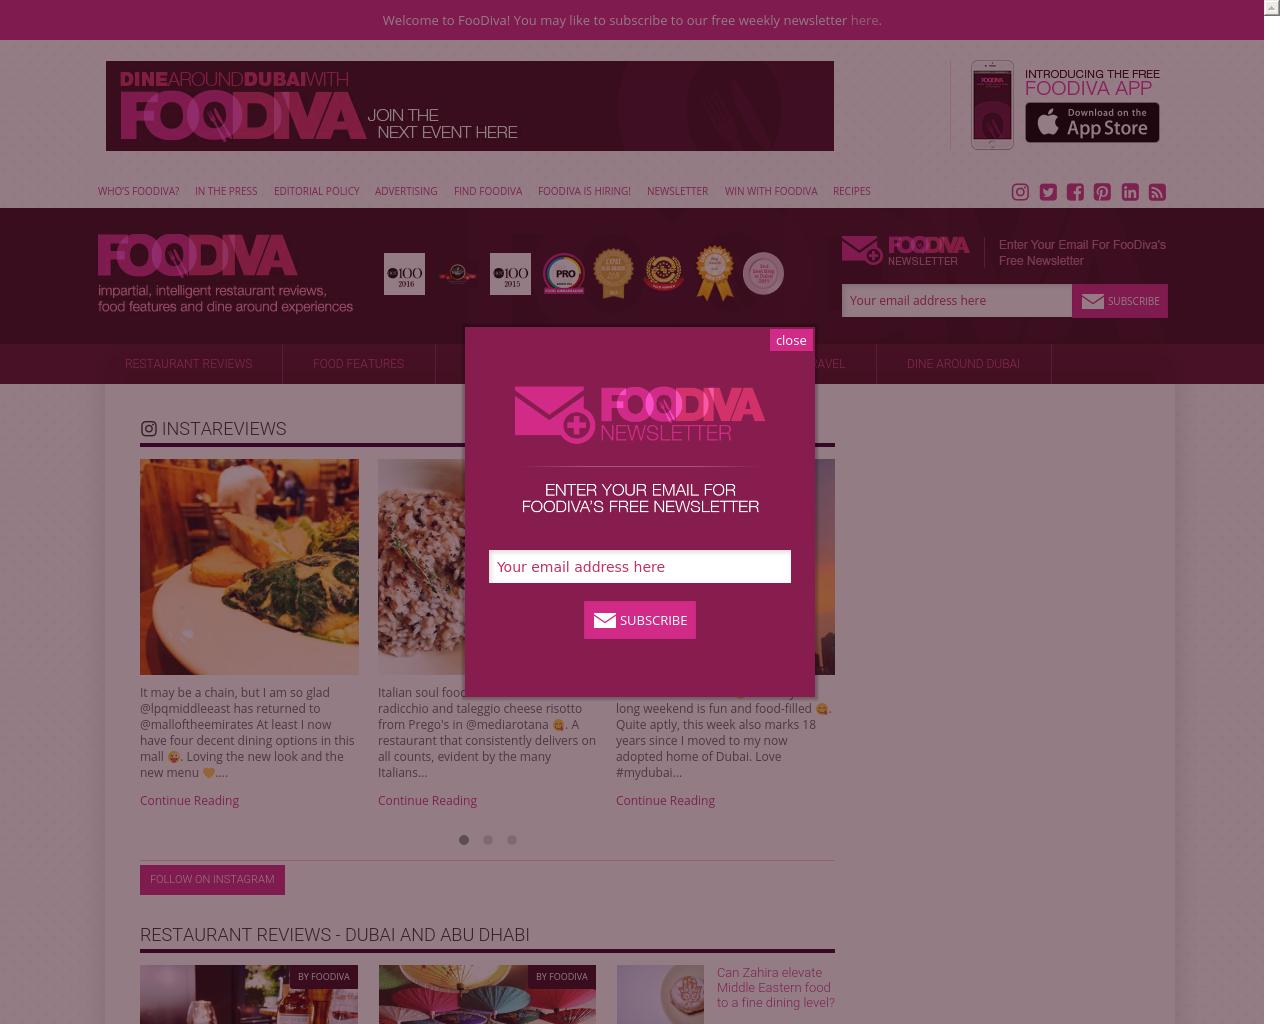 FooDiva-Advertising-Reviews-Pricing